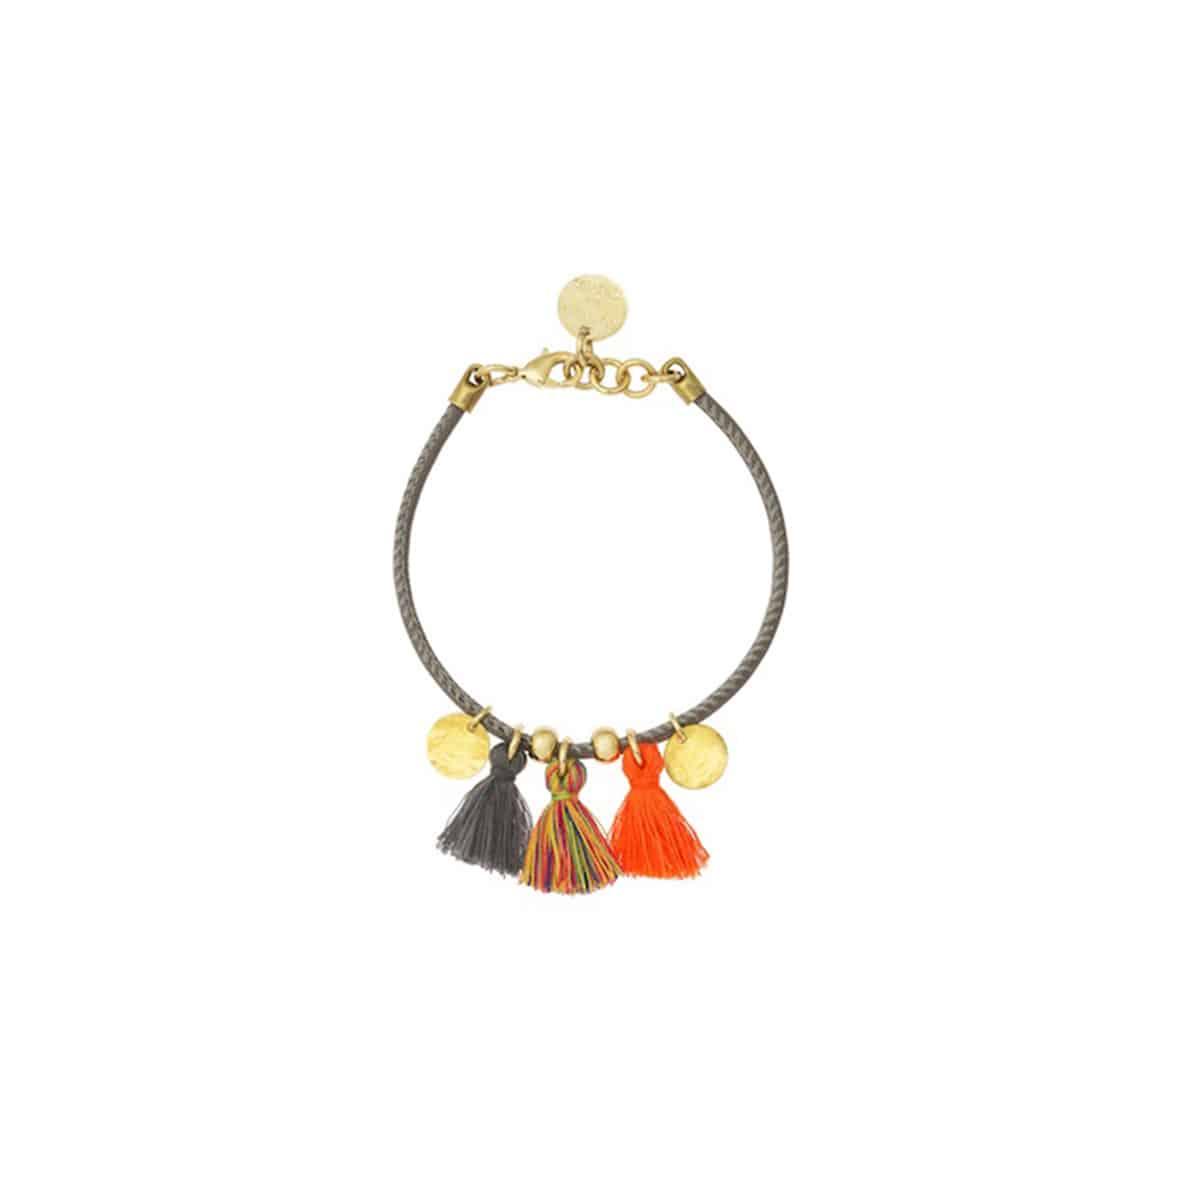 Bracelet Sequin by Coralie de Seynes